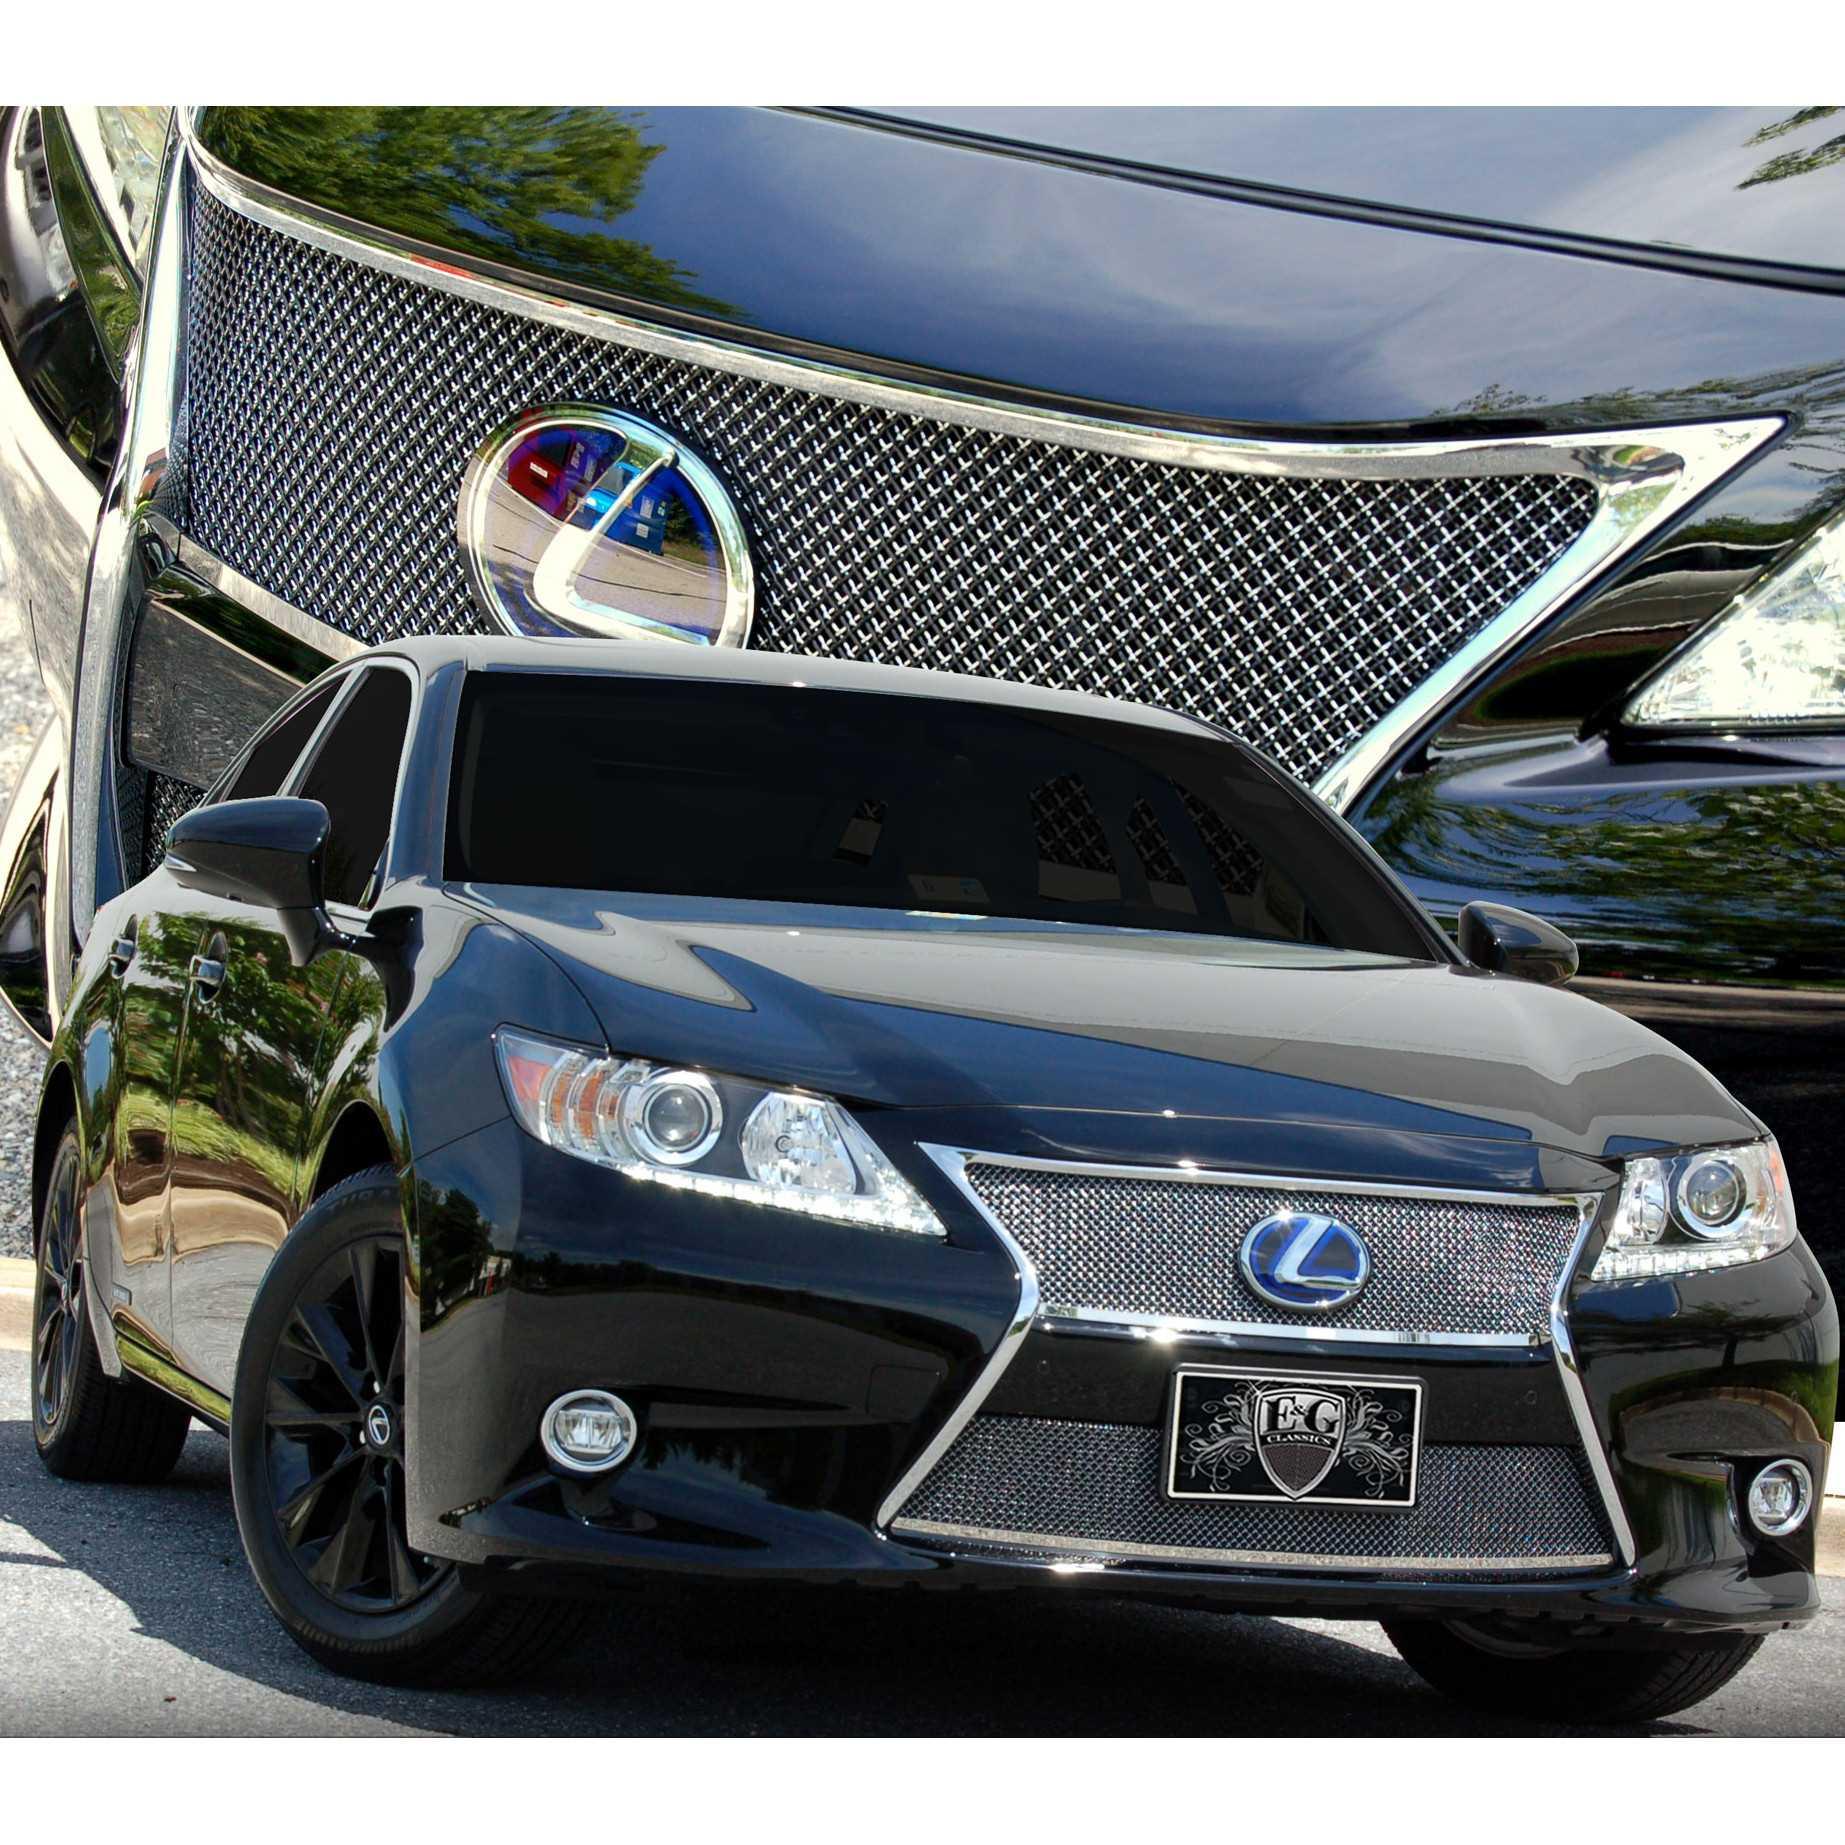 2014 Lexus Es 300h: Custom Grills For Your Car, Truck, Jeep